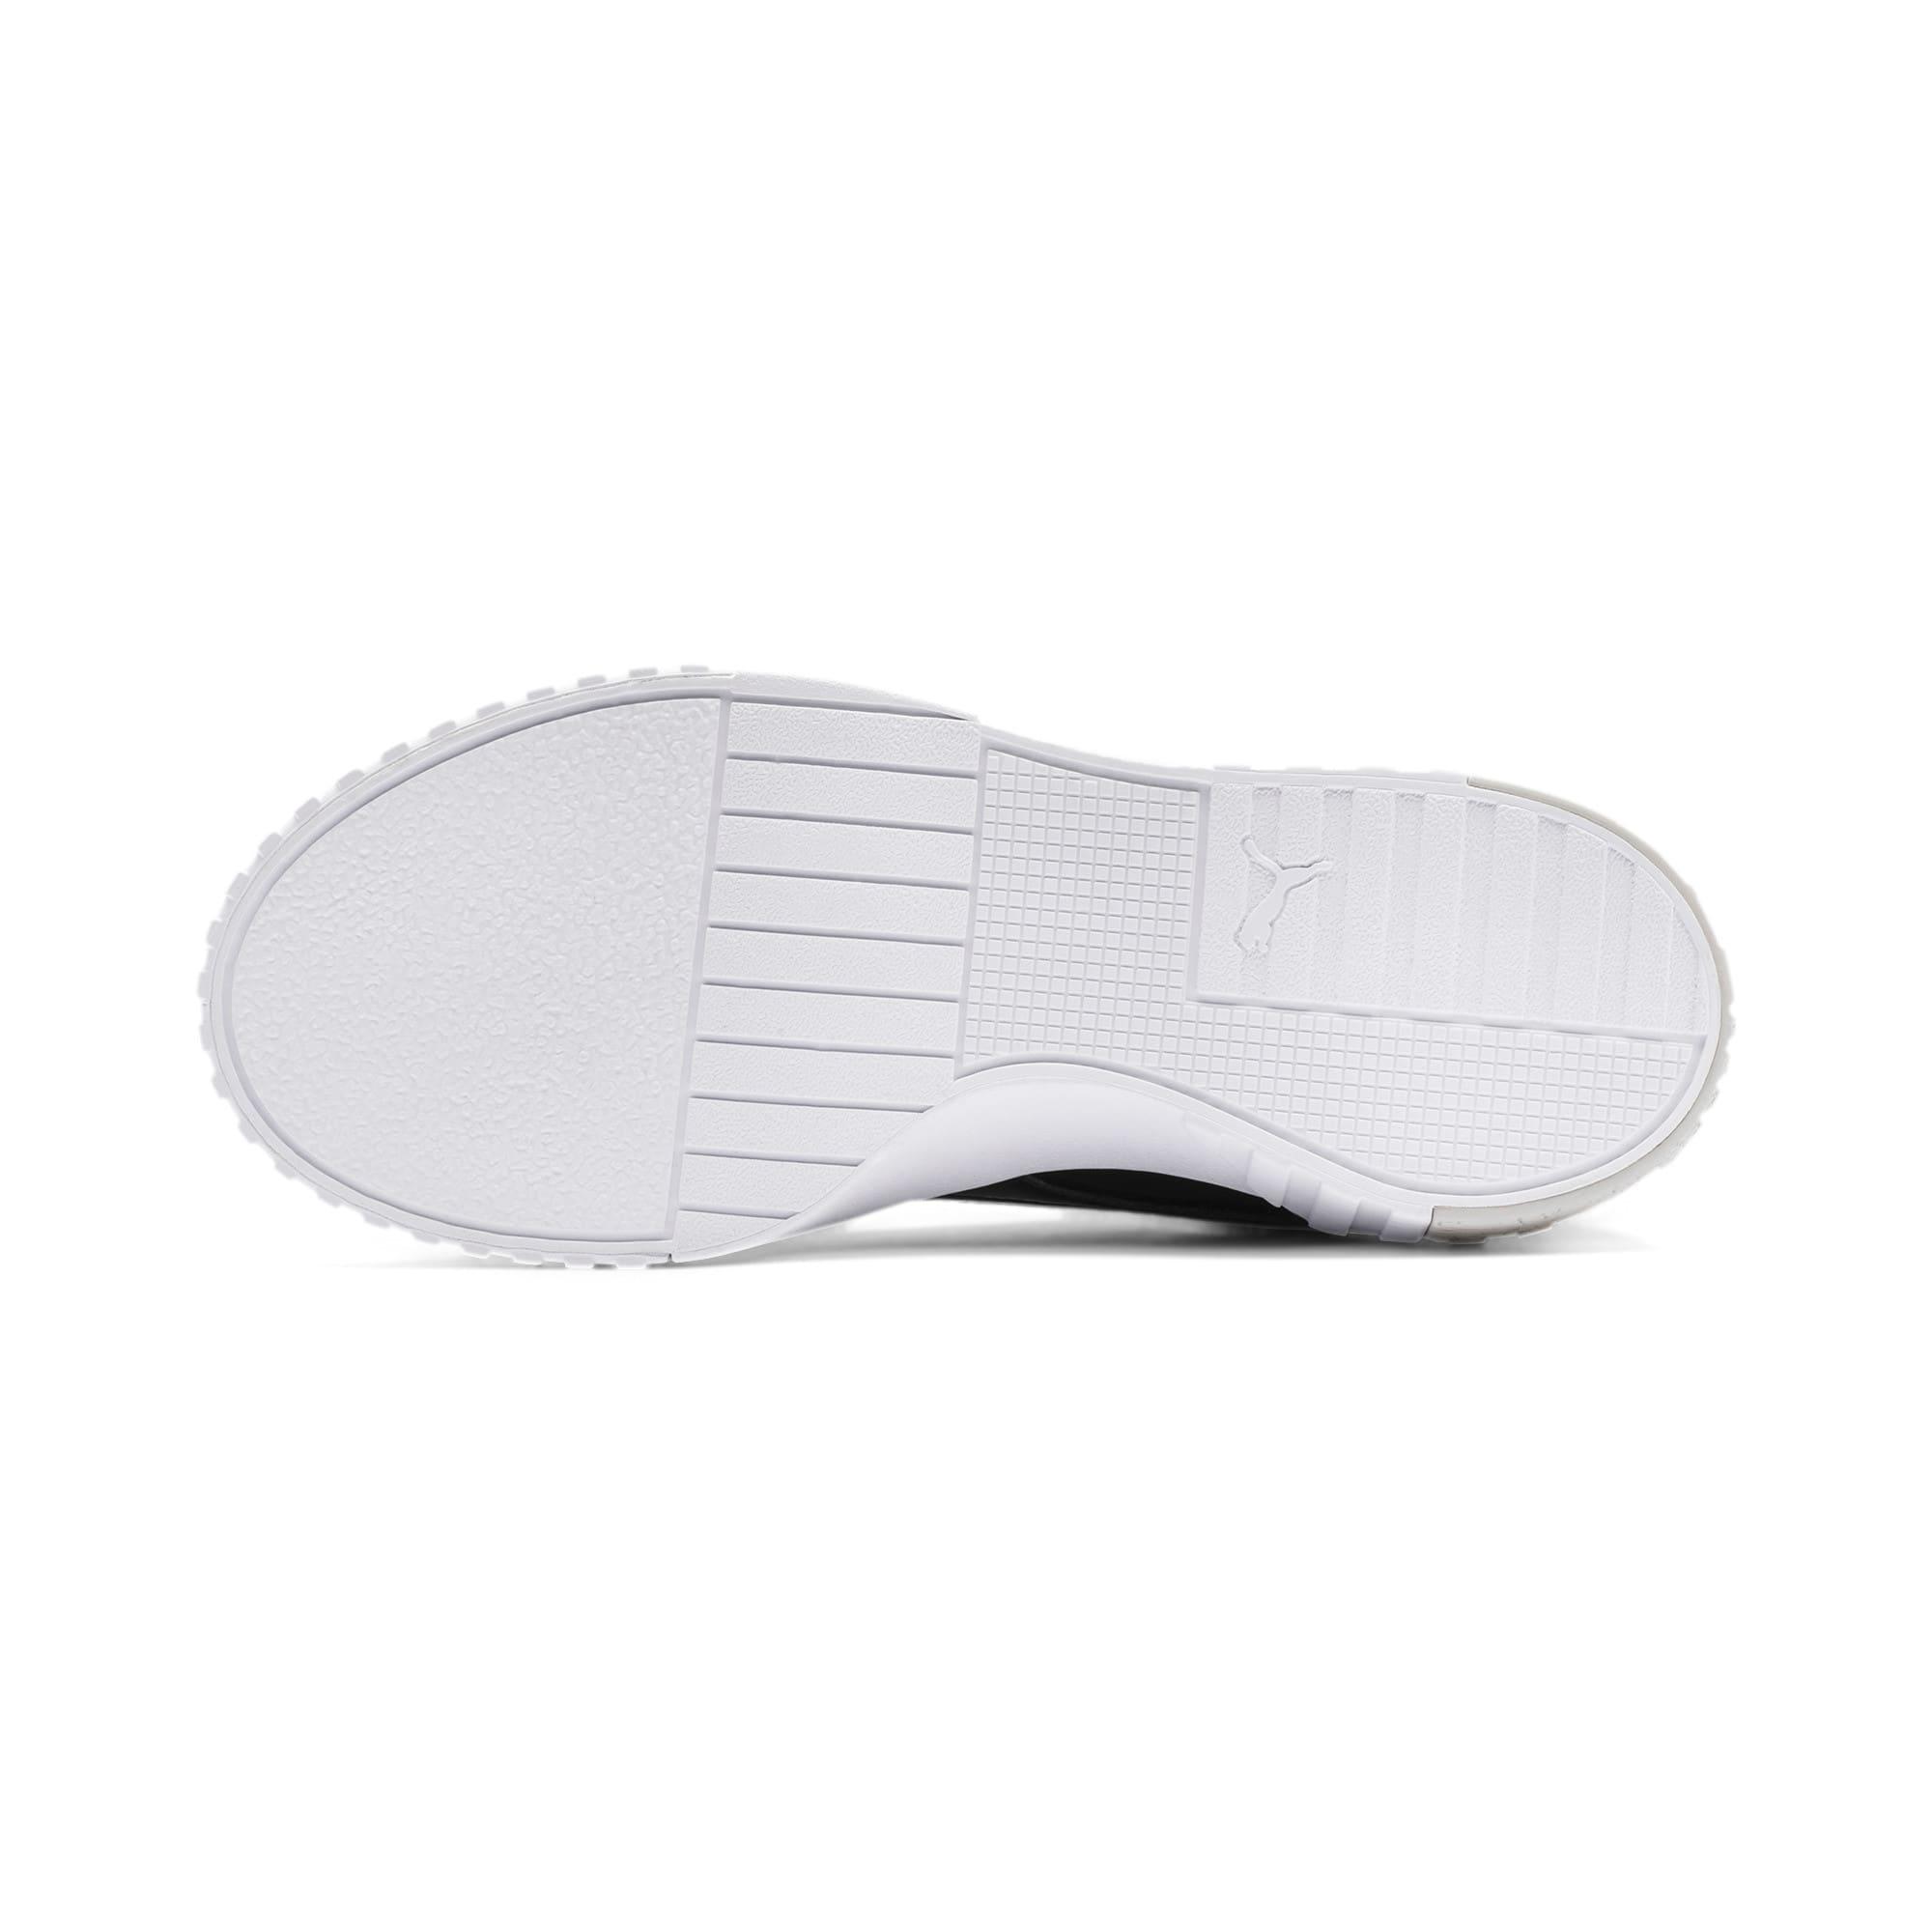 Thumbnail 4 of Cali Patent Sneakers JR, Puma Black-Puma White, medium